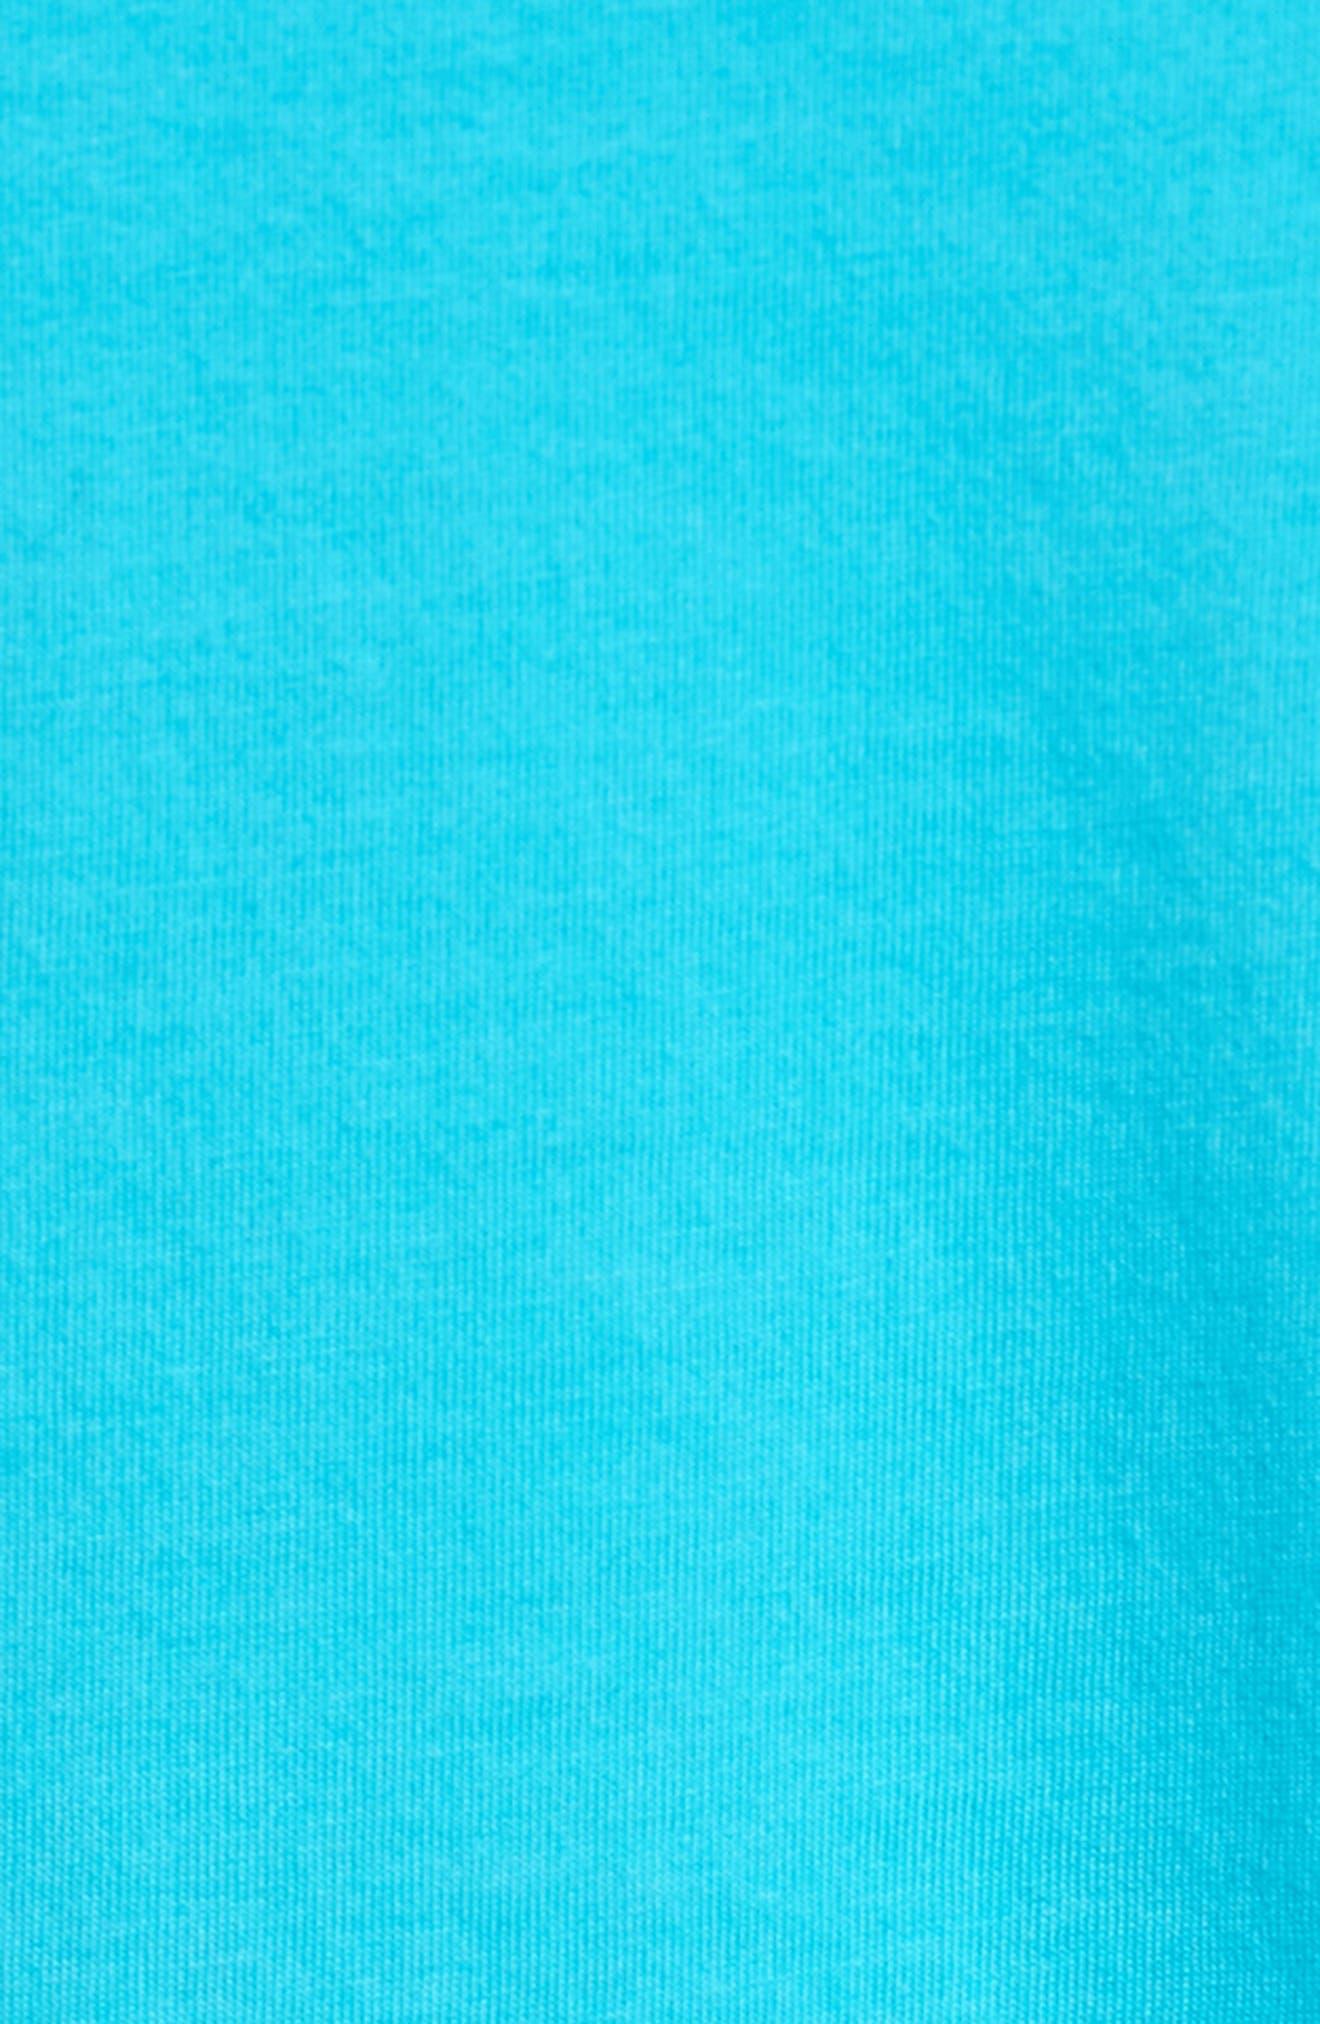 Classic Fit Pocket T-Shirt,                             Alternate thumbnail 5, color,                             Azure